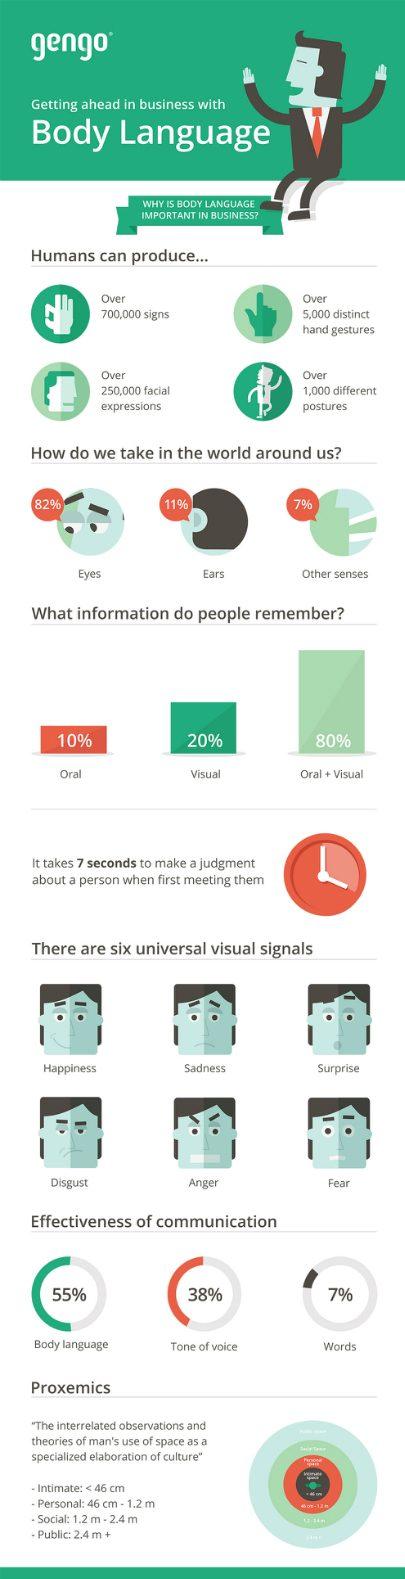 kroppsspråk-viktigt-i-kommunikation